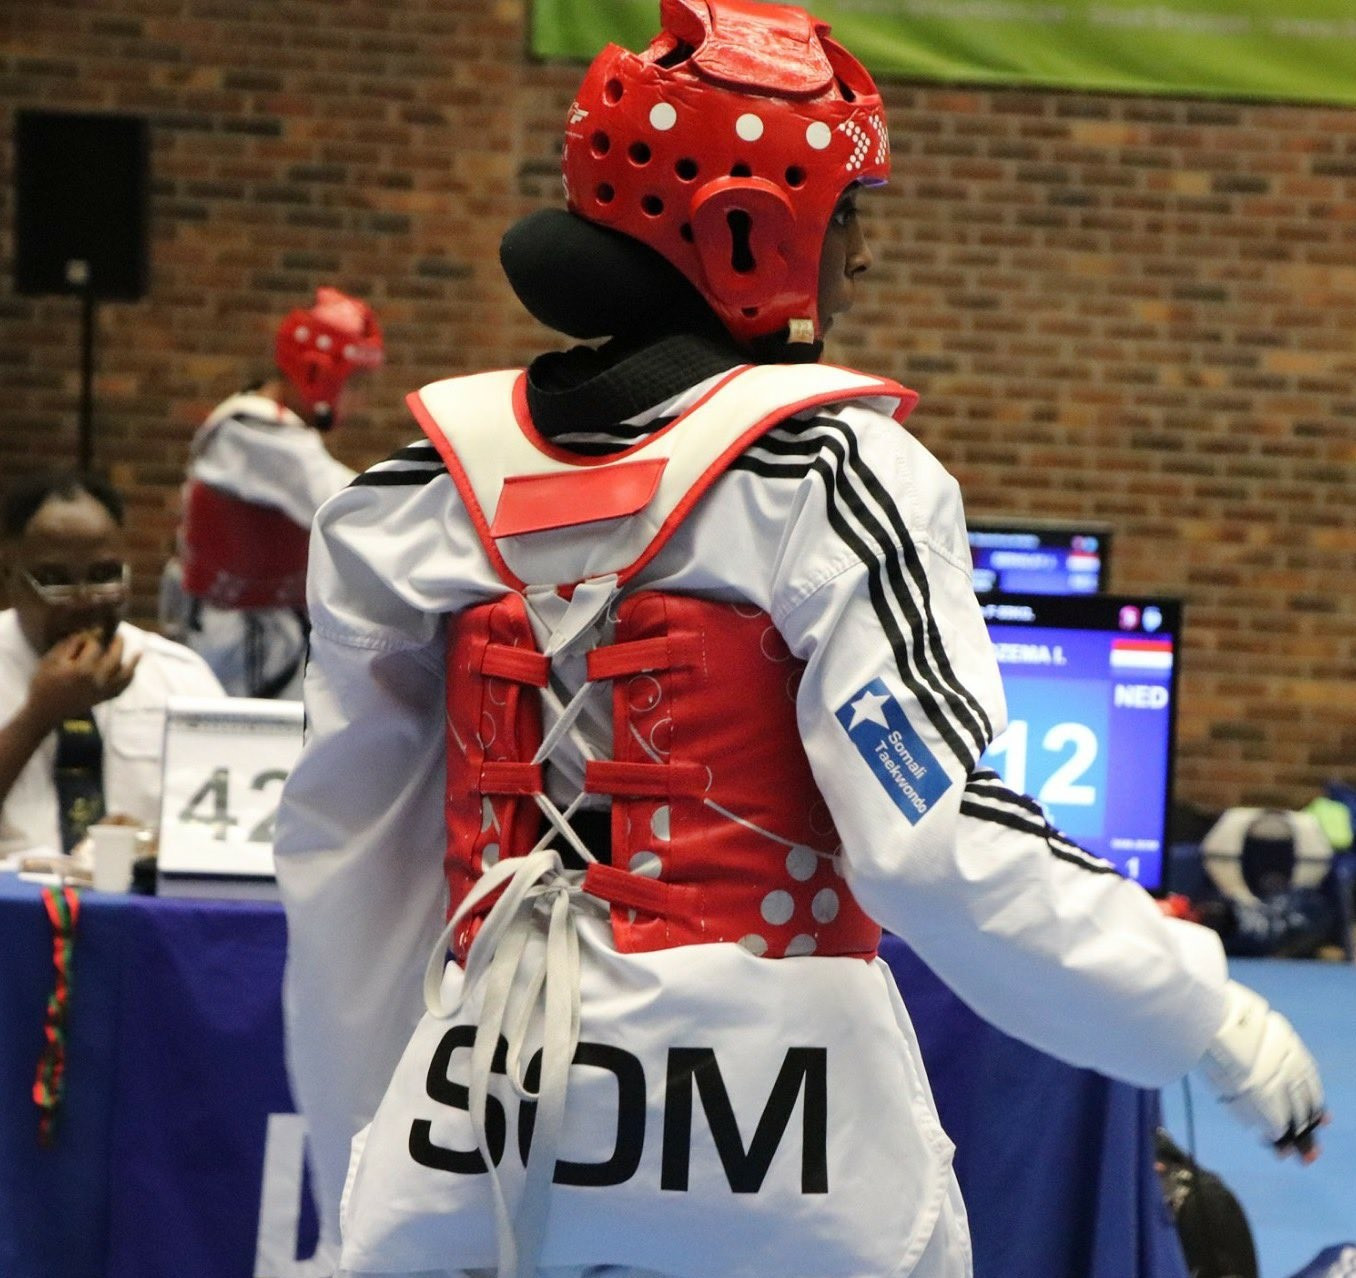 Somalia eyes sending first taekwondo representative to Olympics